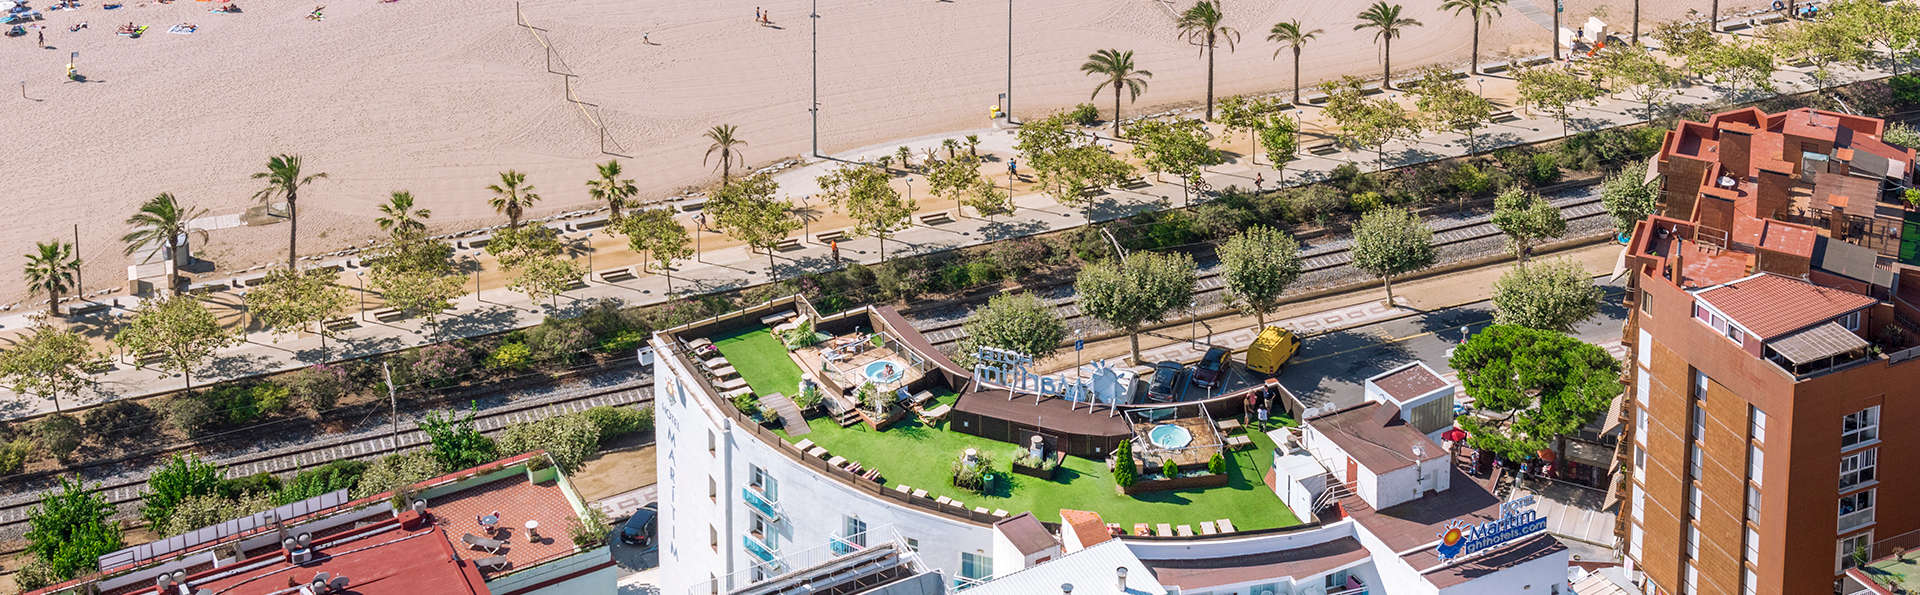 Hotel GHT Maritim - EDIT_NEW_VIEW.jpg